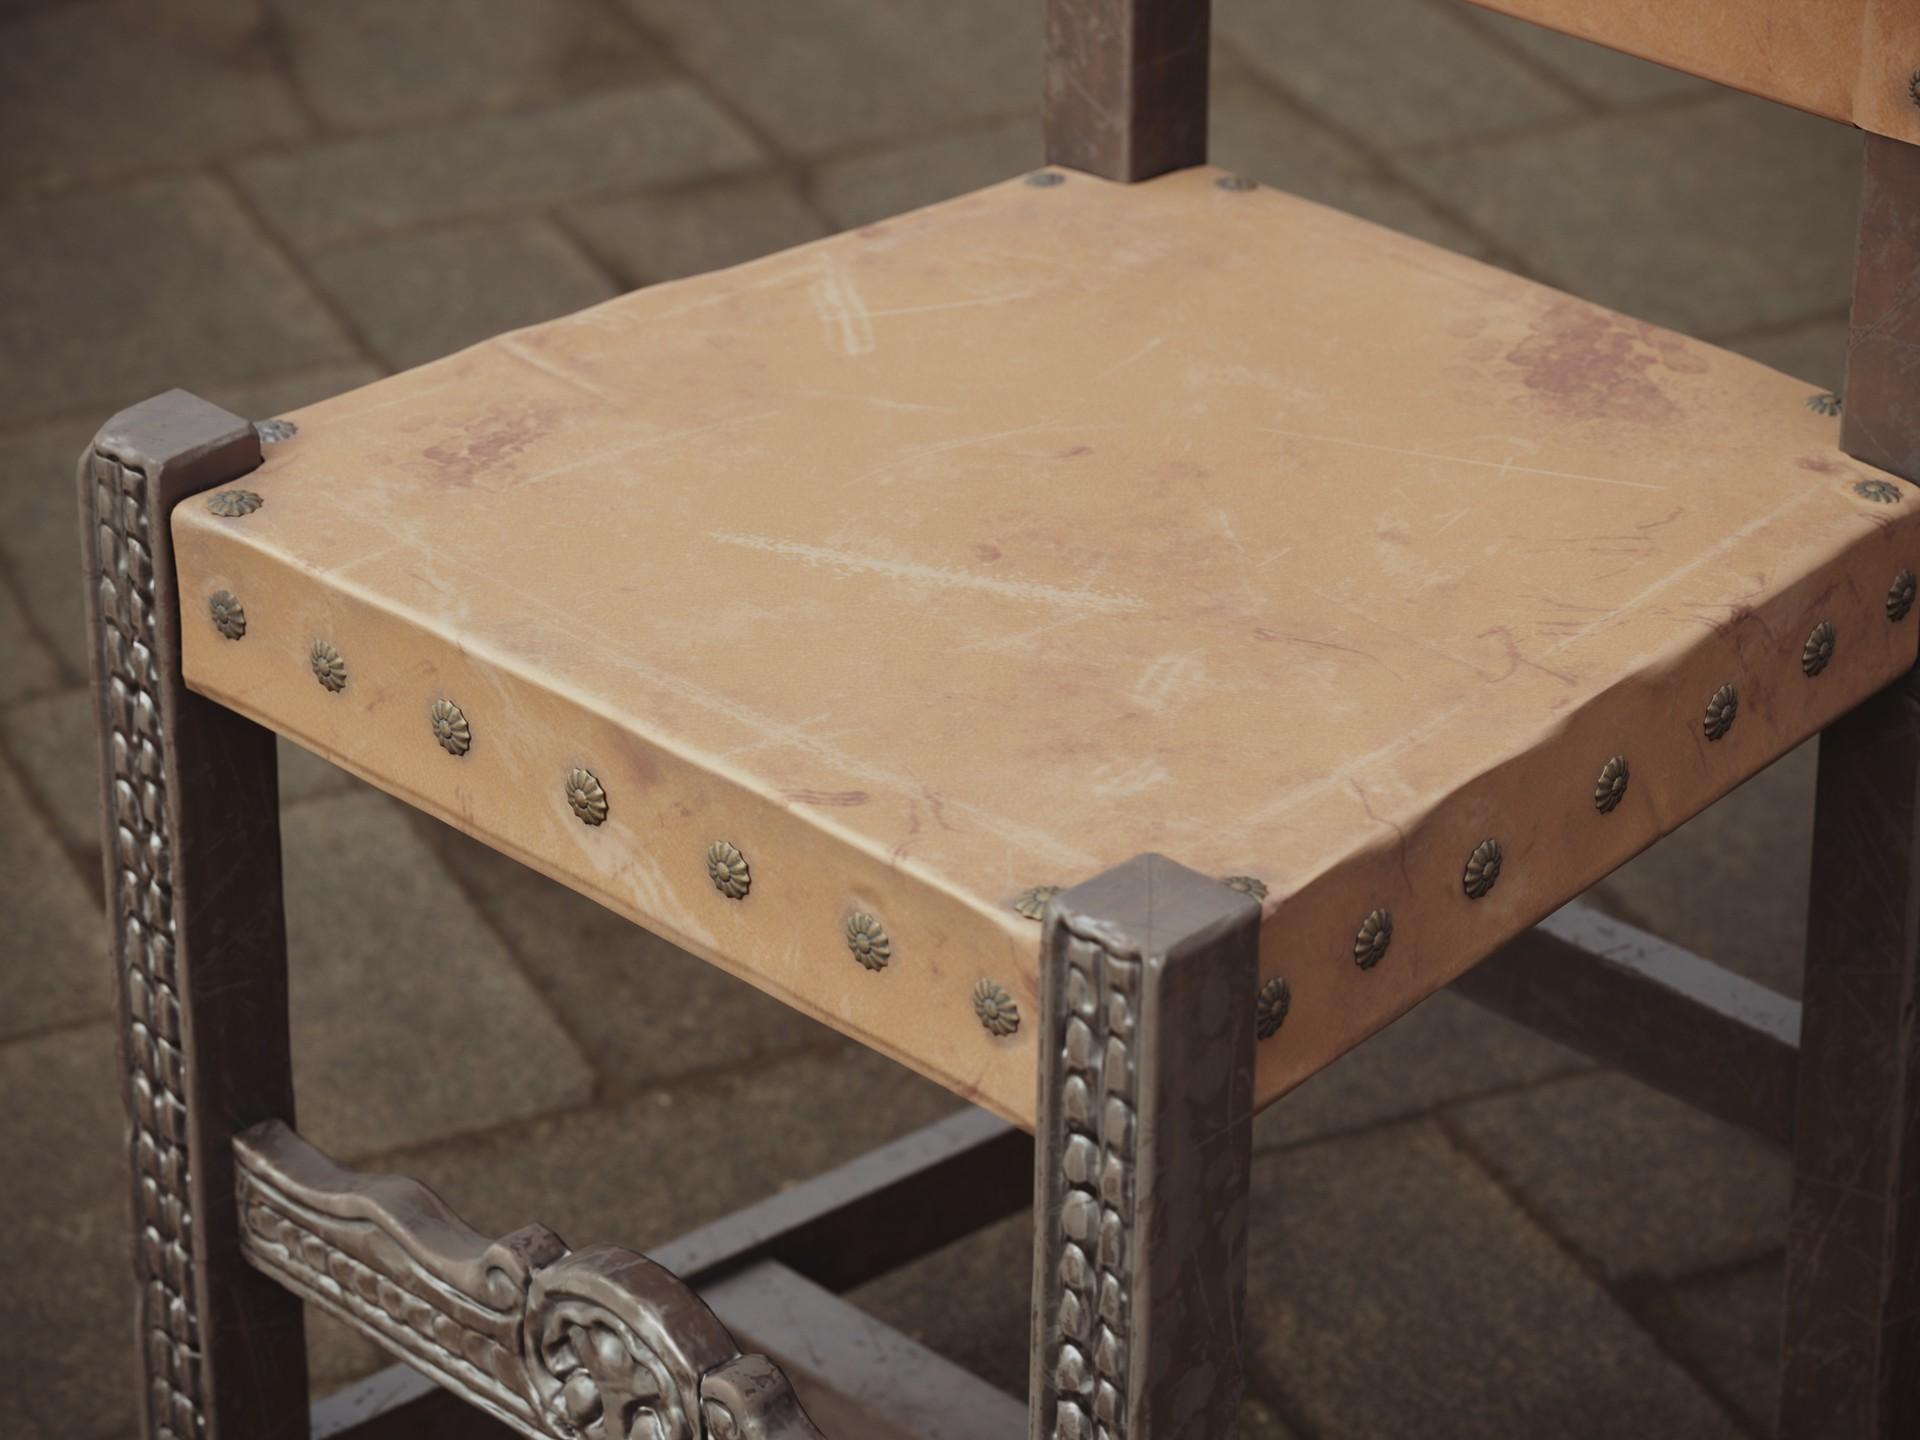 Luis santander castillan chair 2